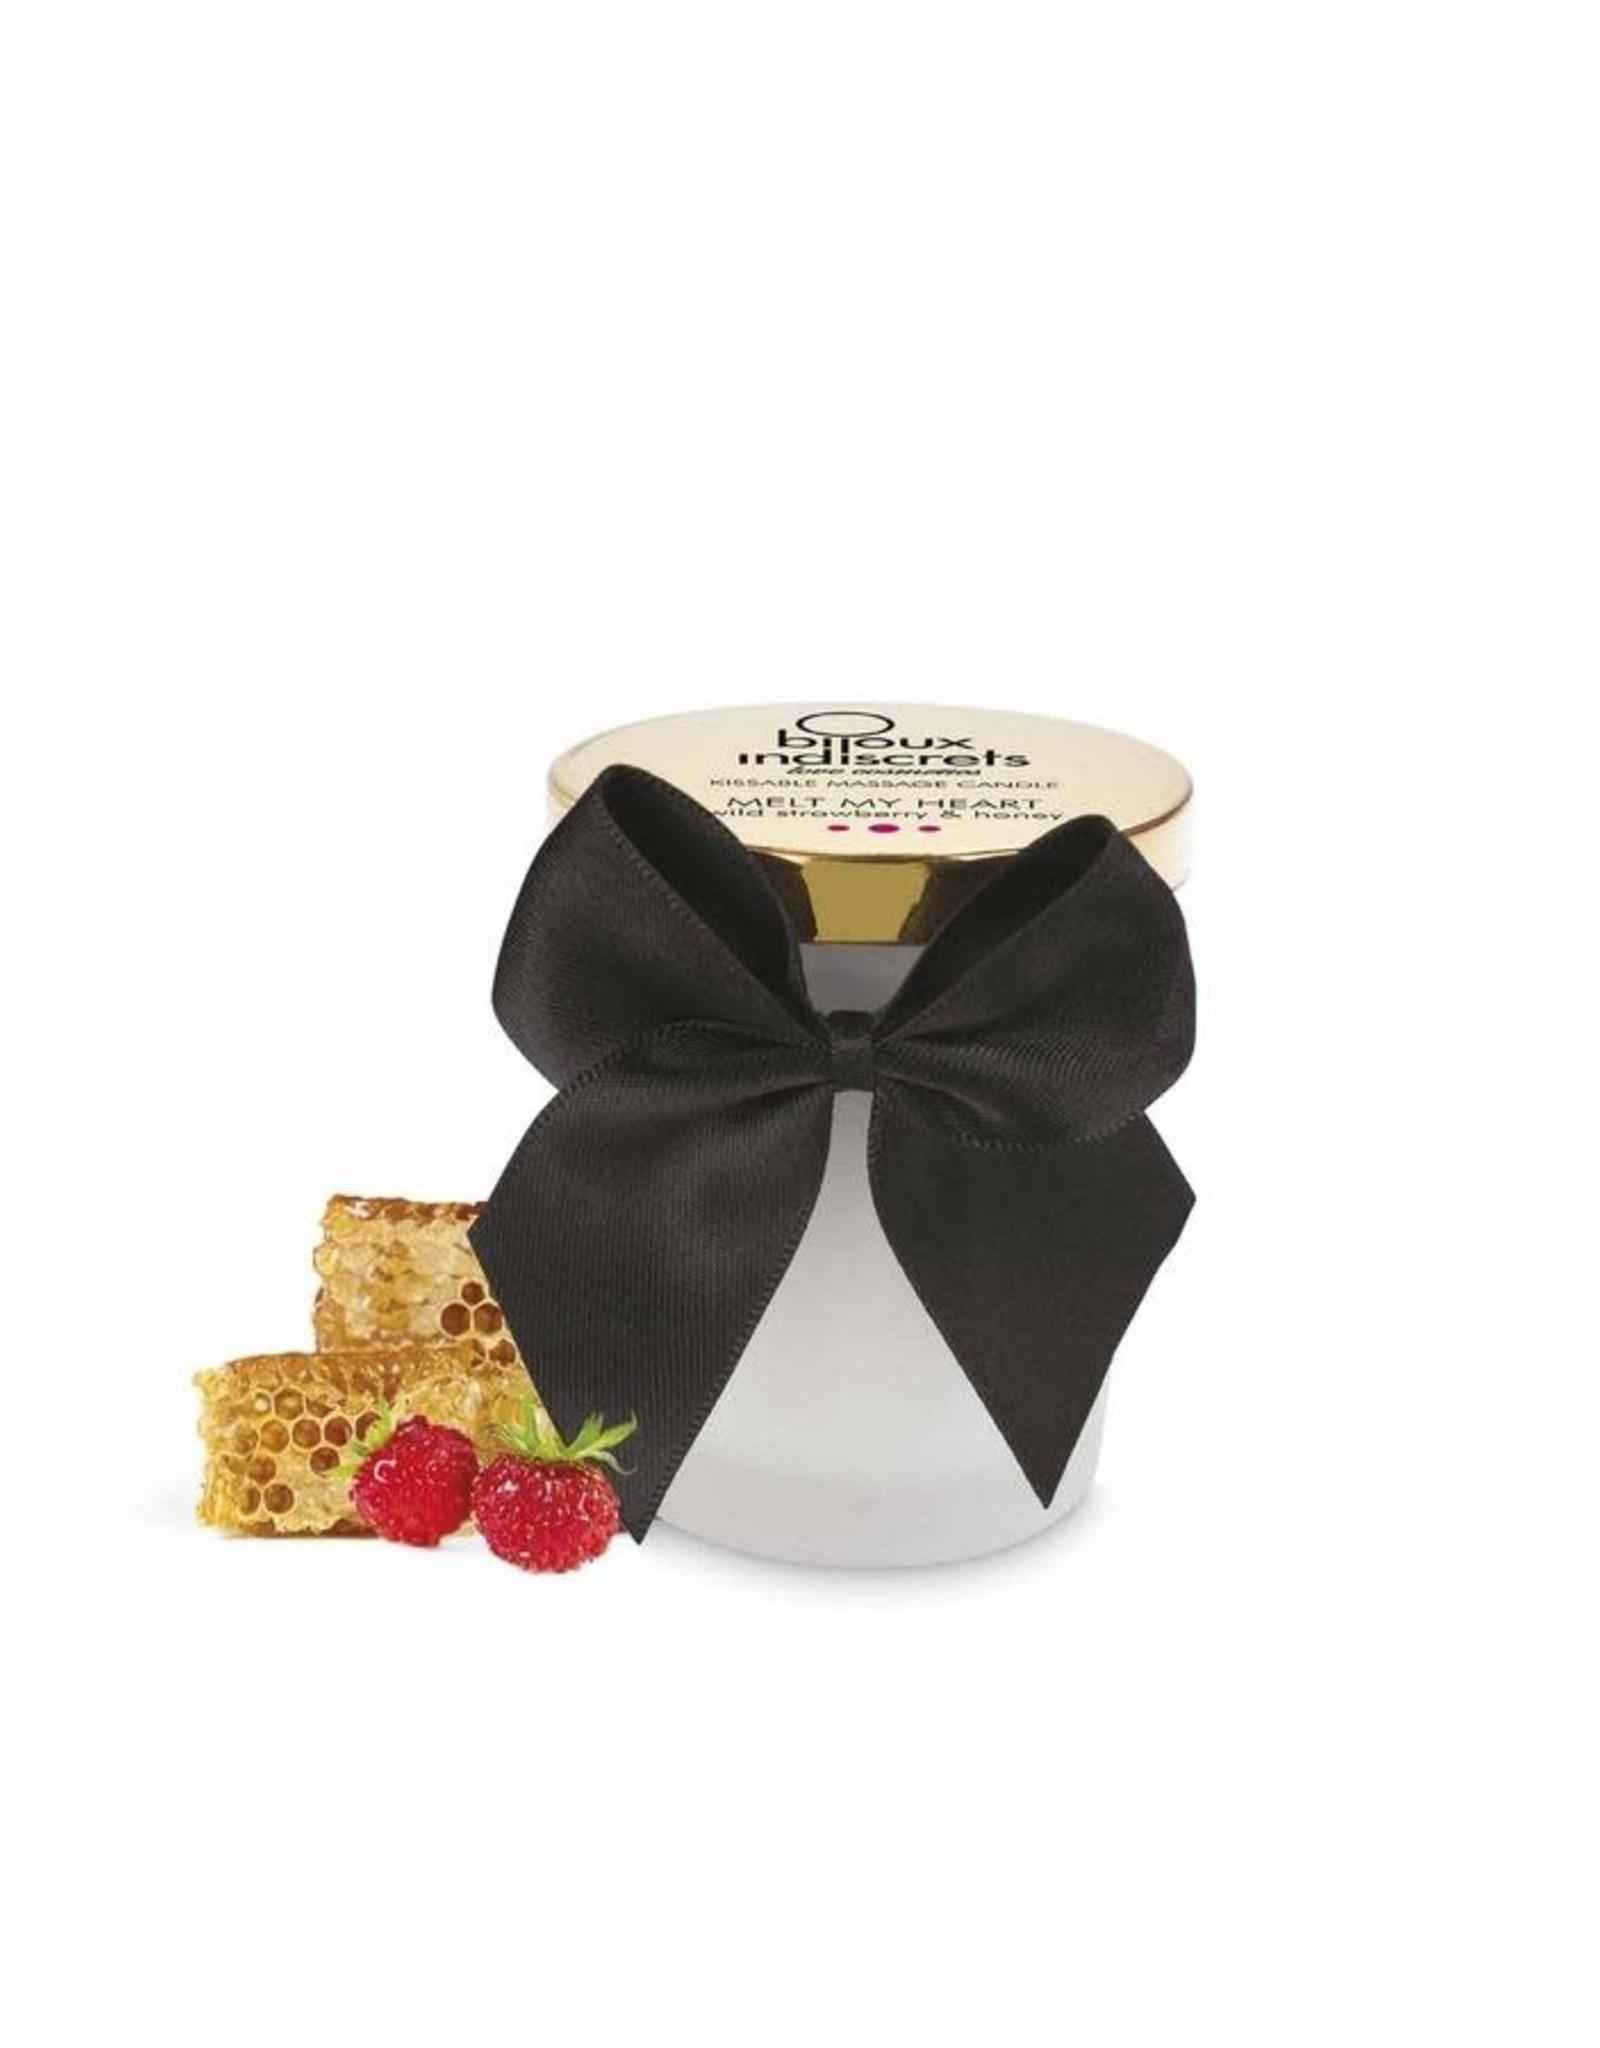 Bijoux Indiscrets Melt my heart - Kissable massage candle - Wild Strawberry & Honey